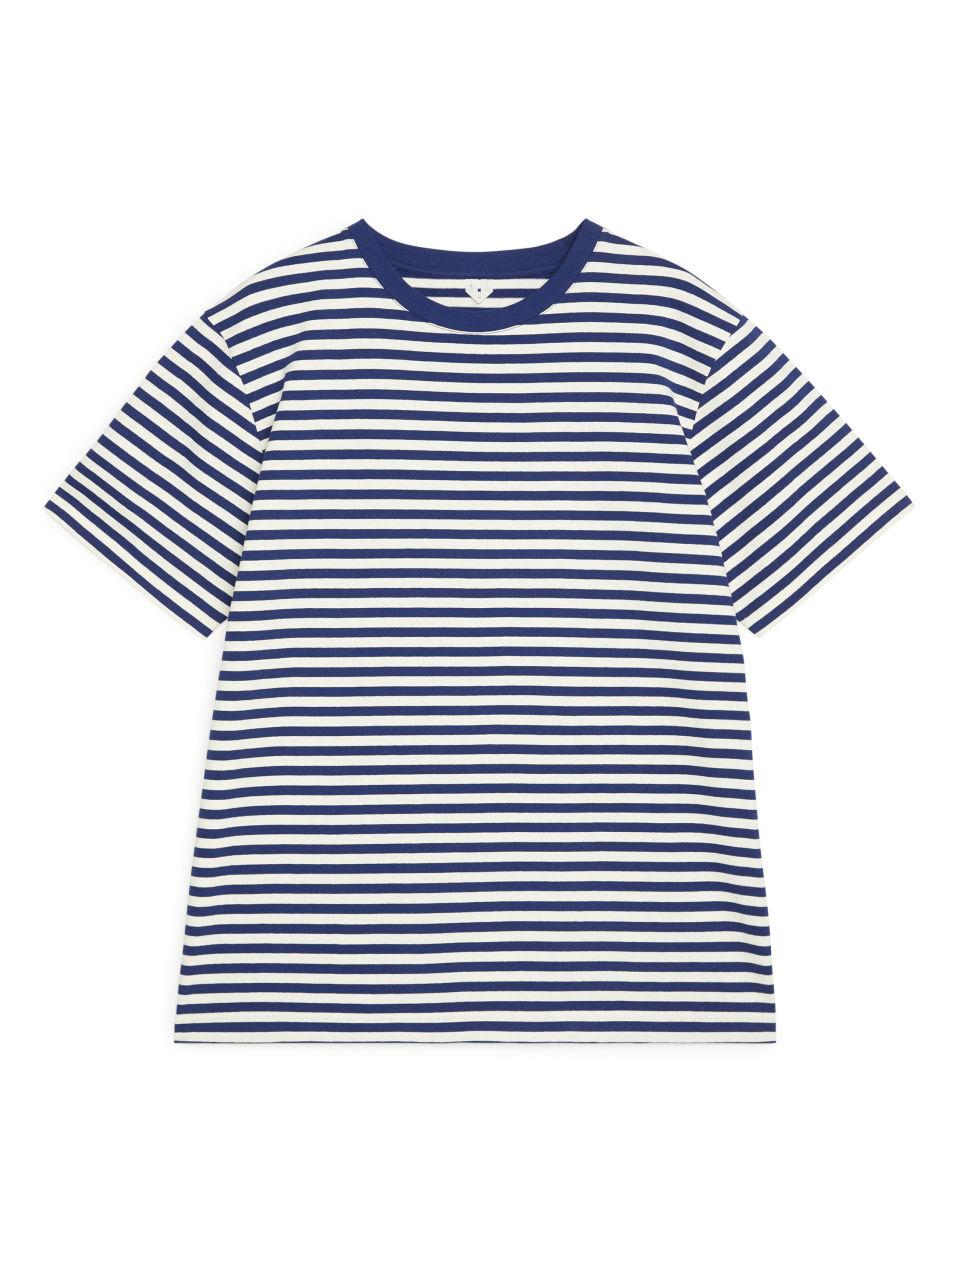 Striped Organic Cotton T-Shirt - Blue